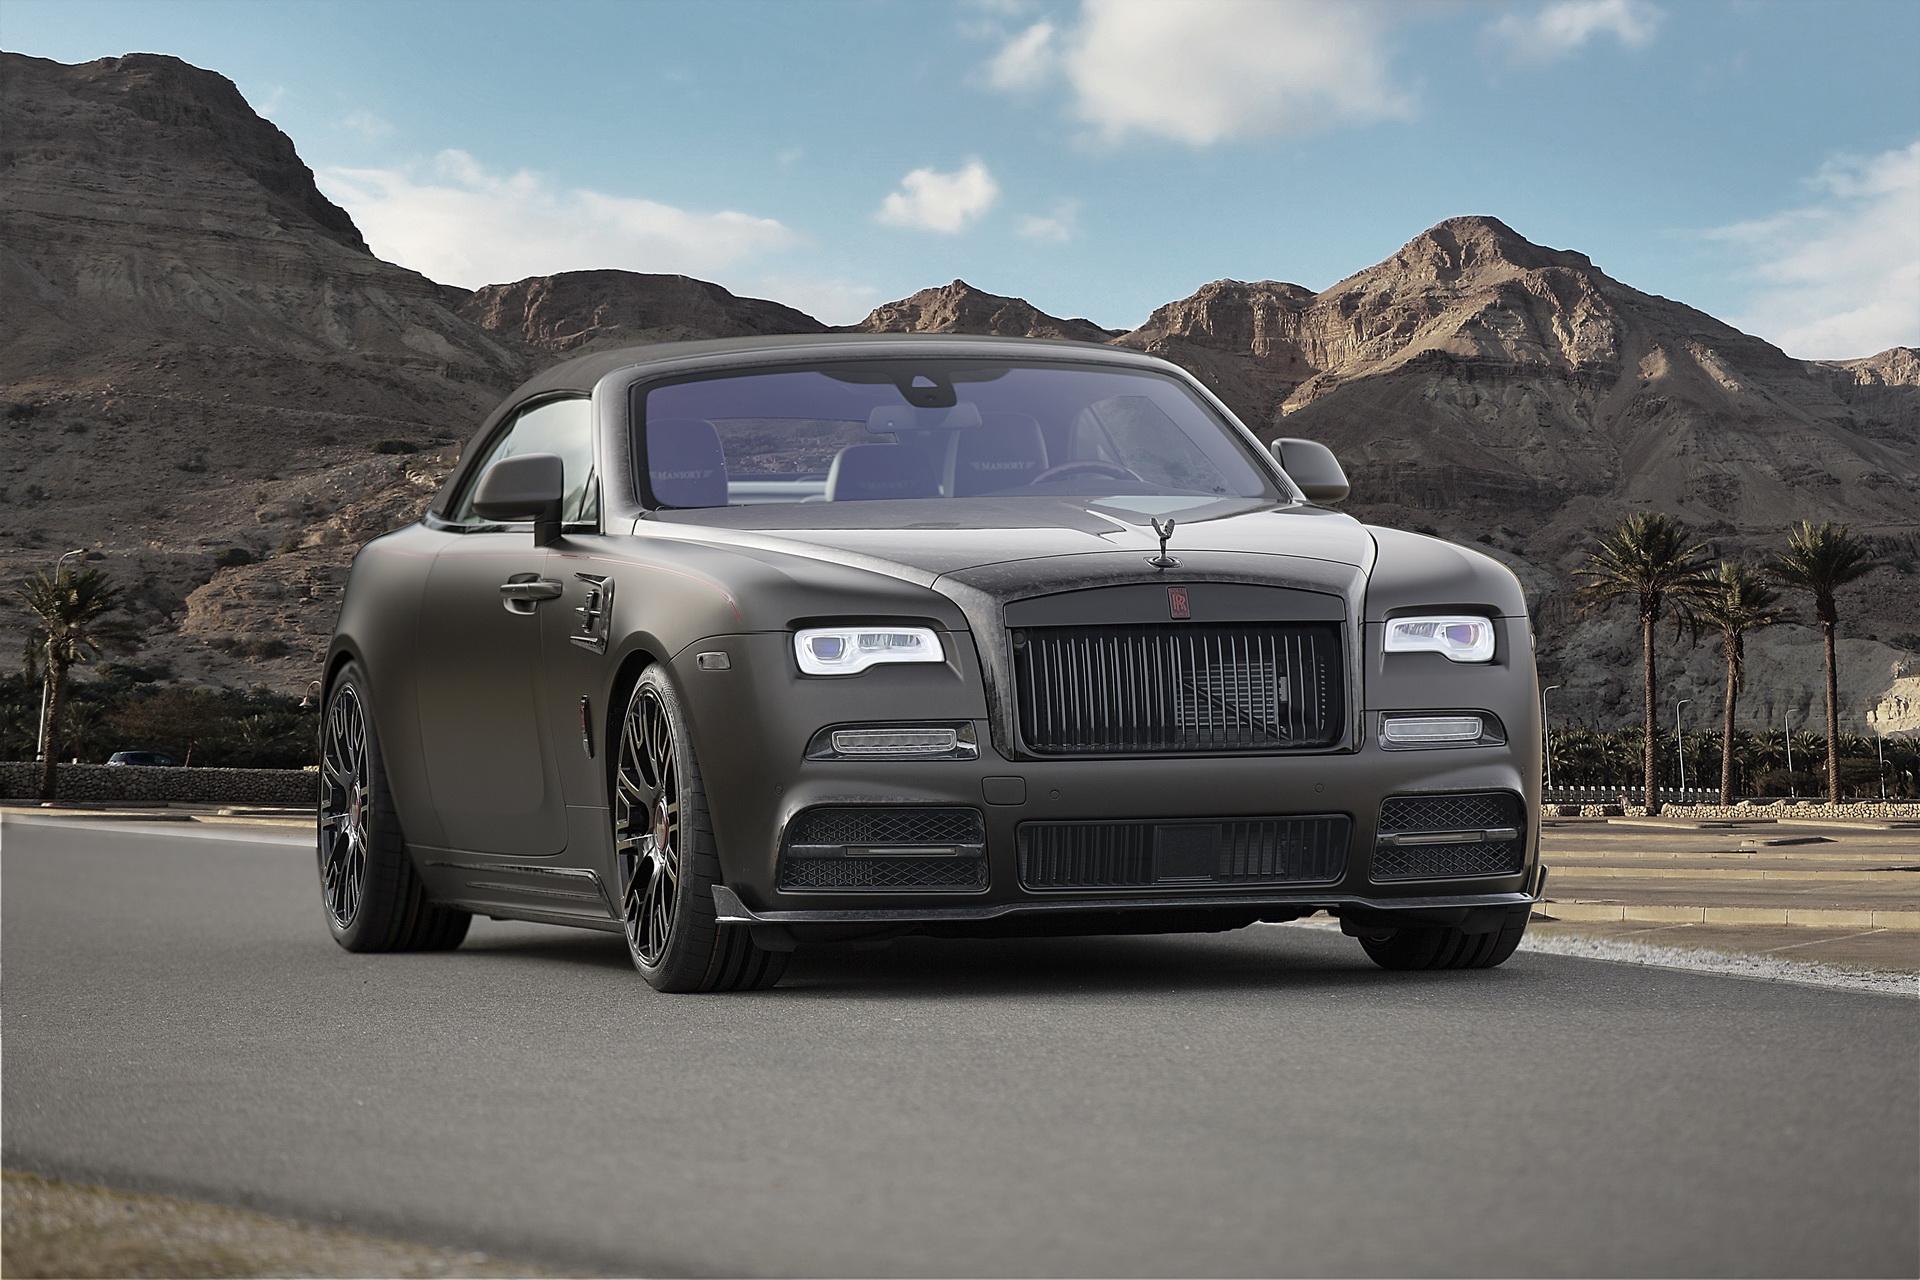 Wallpaper Rolls Royce Car 1920x1280 Danielm24 1284581 Hd